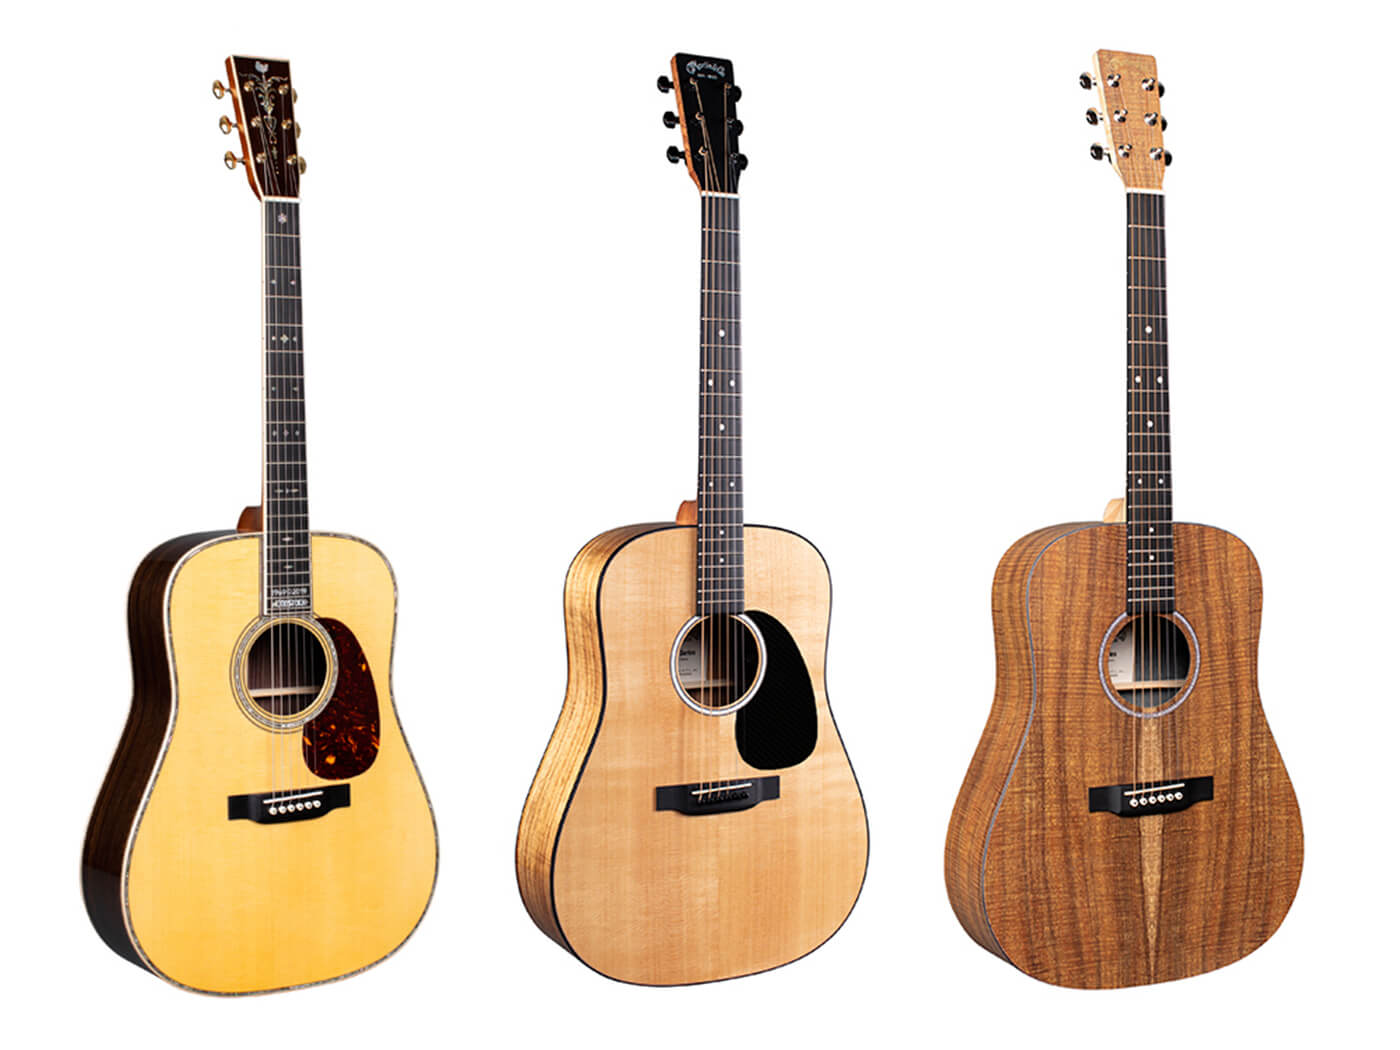 Martin Fall line acoustics